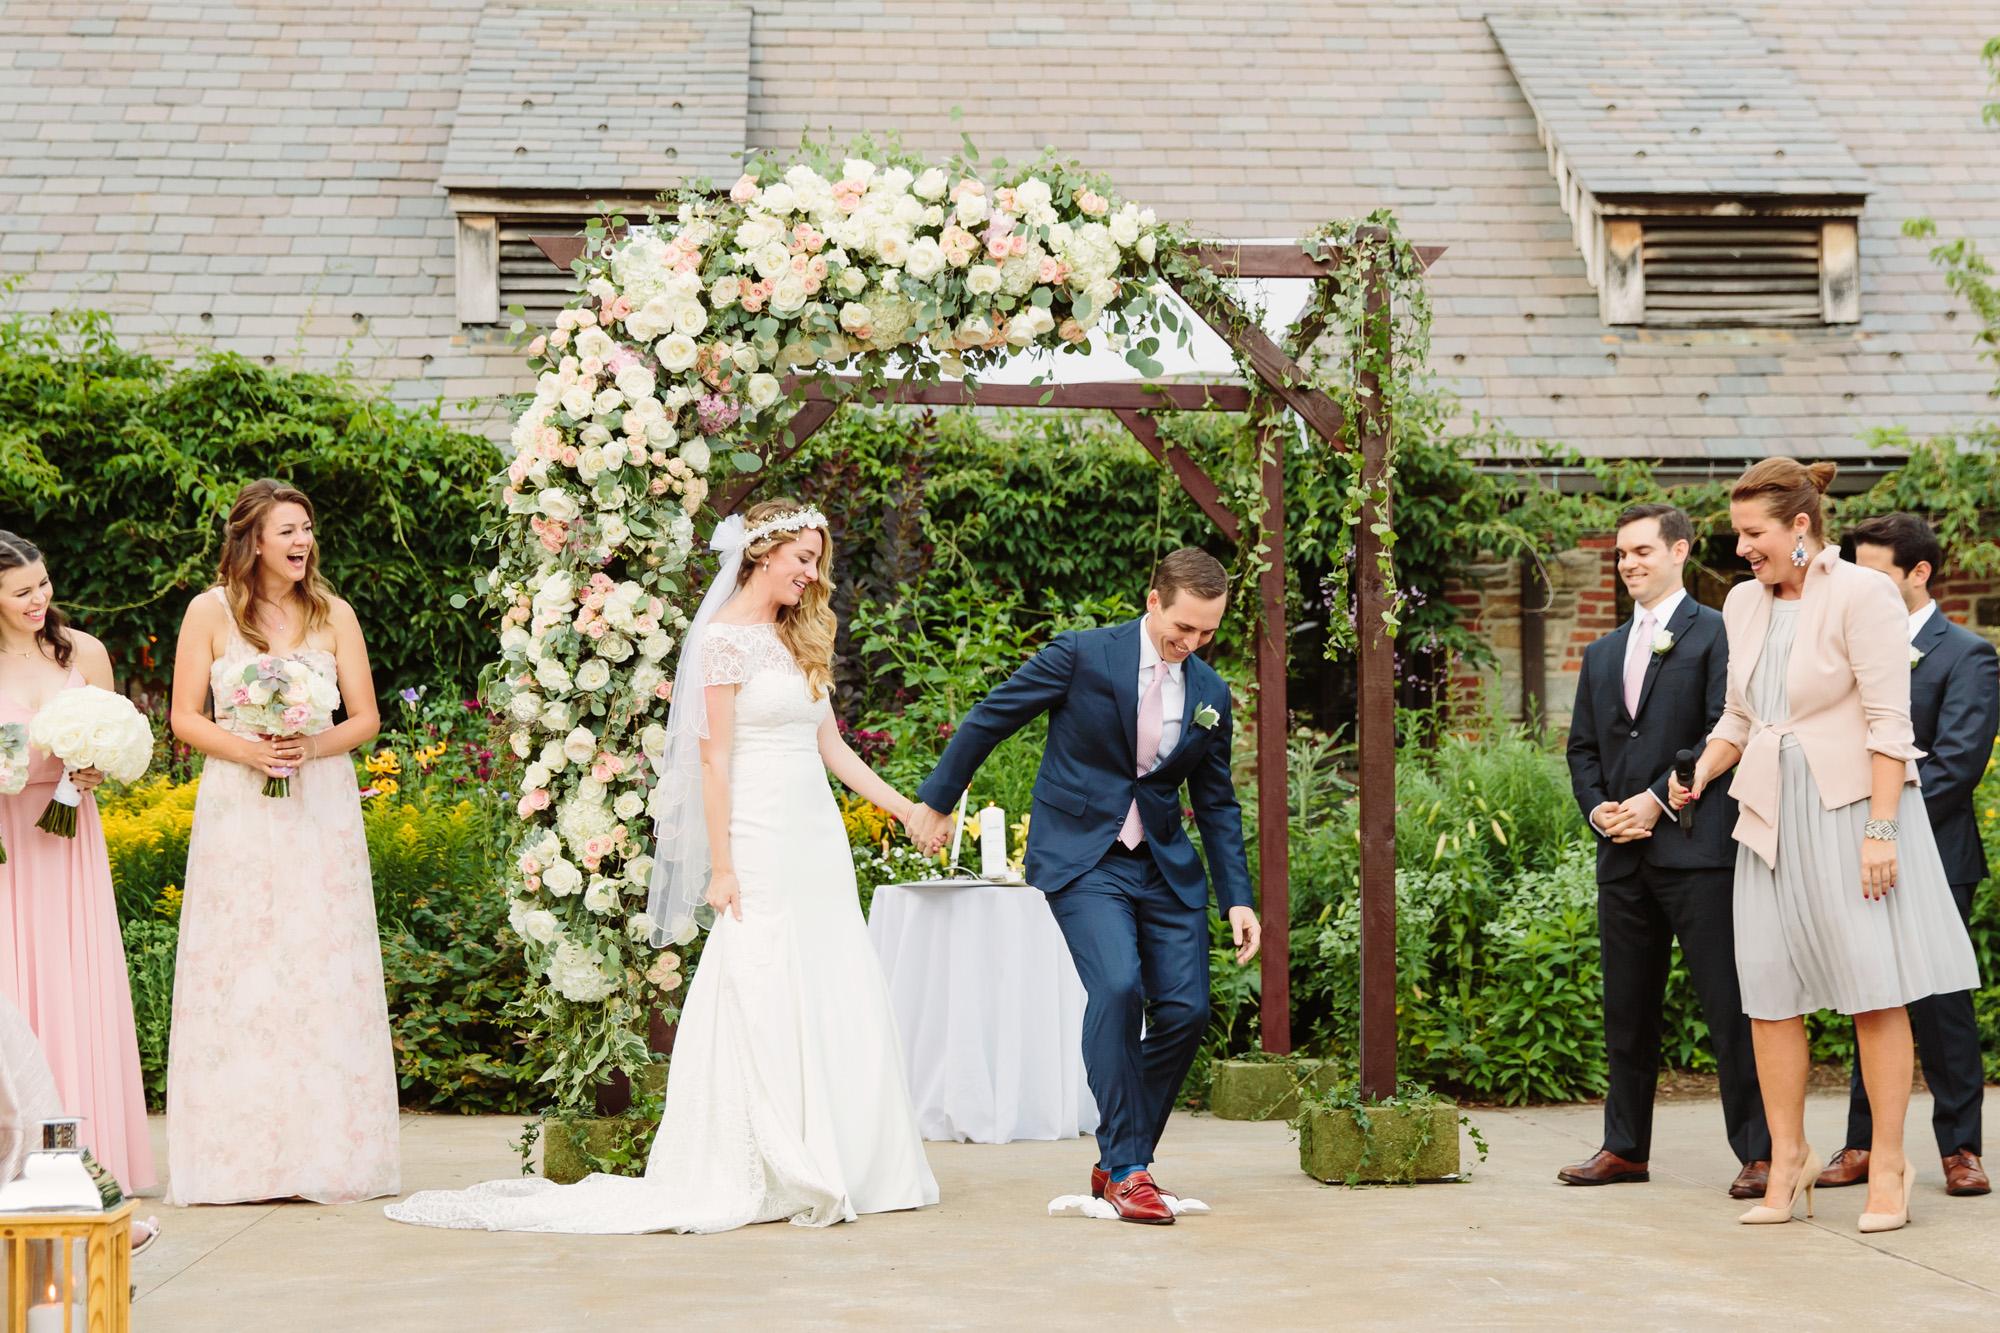 49_Jessica_Ted_Blue_Hill_Stone_Barns_Wedding_Pocantico_NY_Tanya_Salazar_Photography_136.jpg